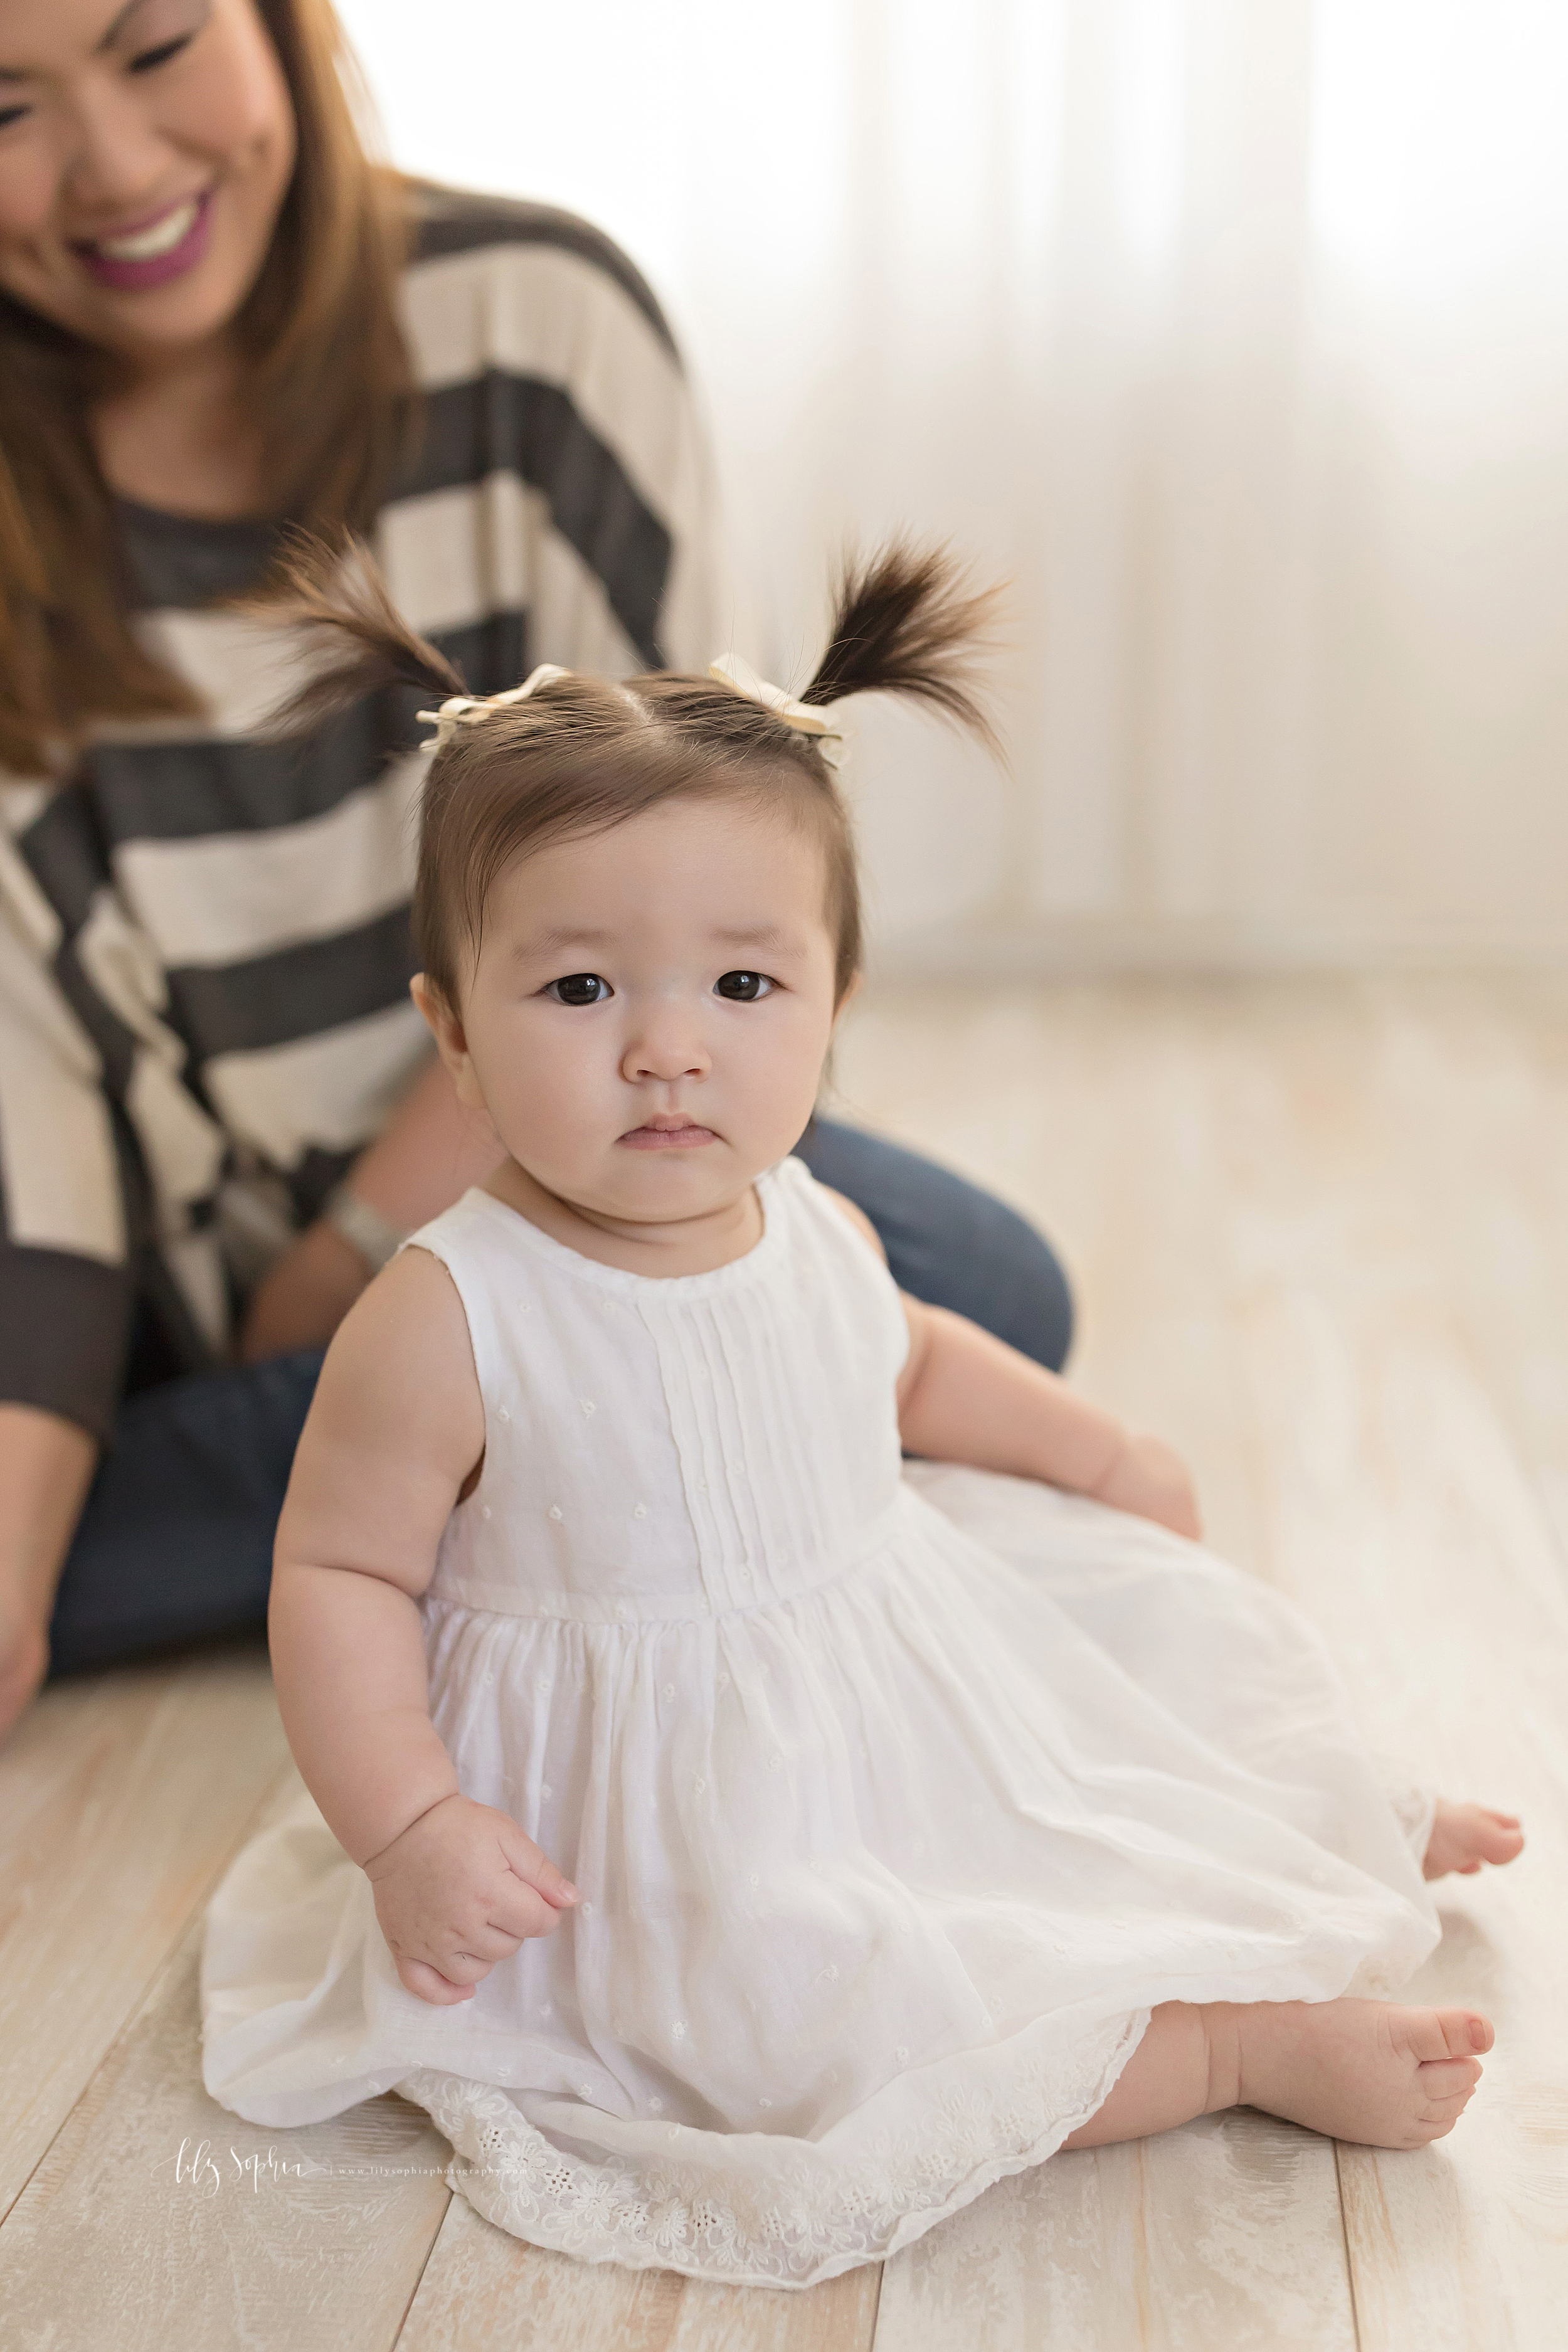 atlanta-midtown-brookhaven-decatur-lily-sophia-photography-photographer-portraits-grant-park-studio-six-month-milestone-baby-girl-big-sister-family_0128.jpg